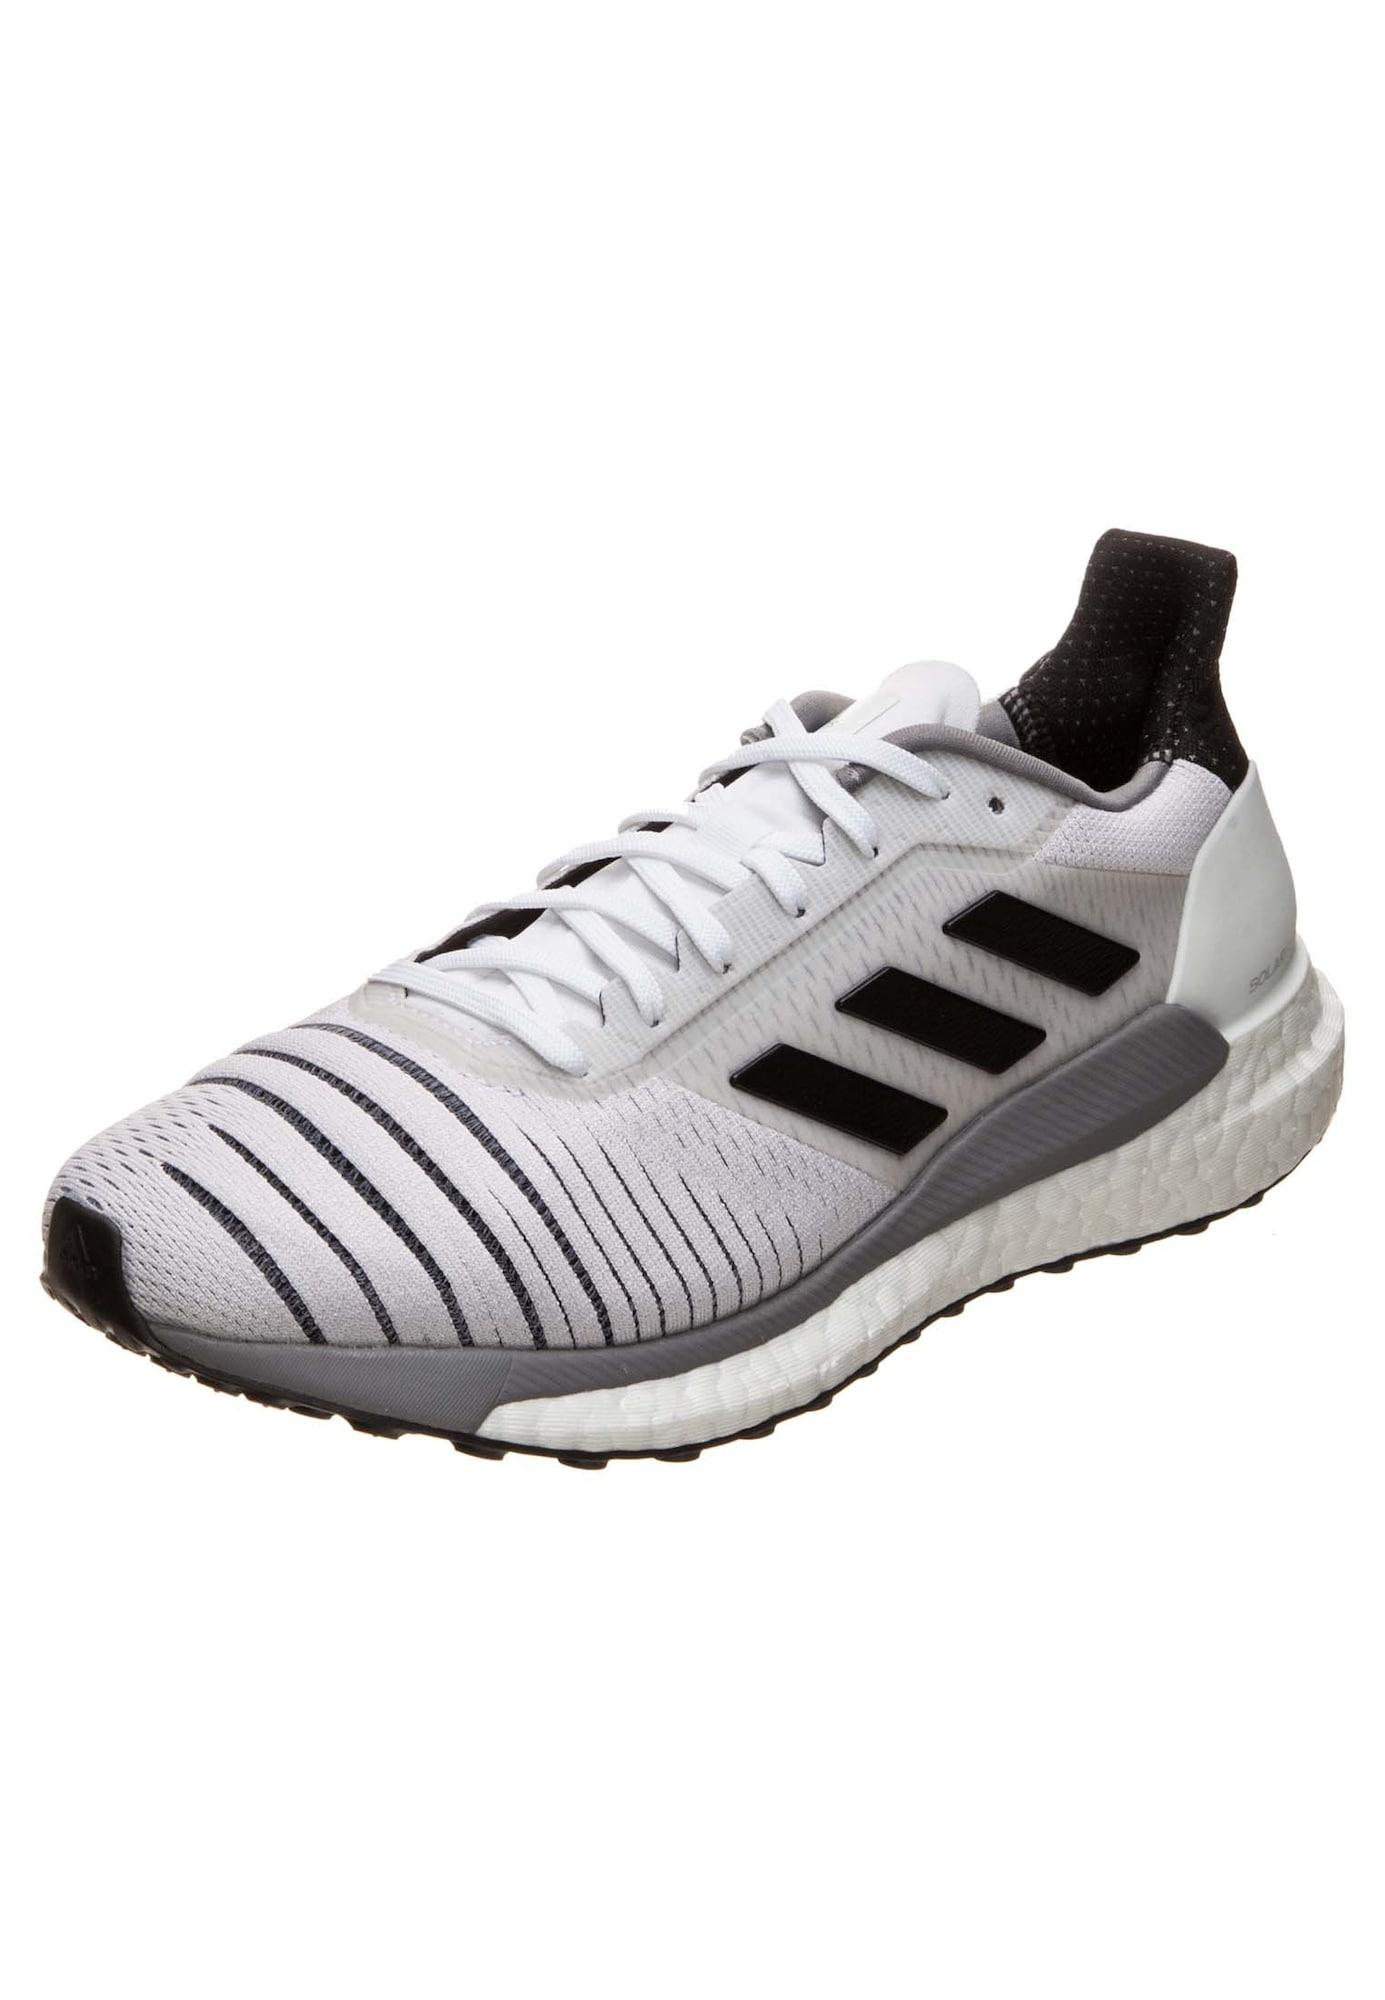 imwalking   Damen Nike Laufschuh Air Zoom Terra Kiger 4